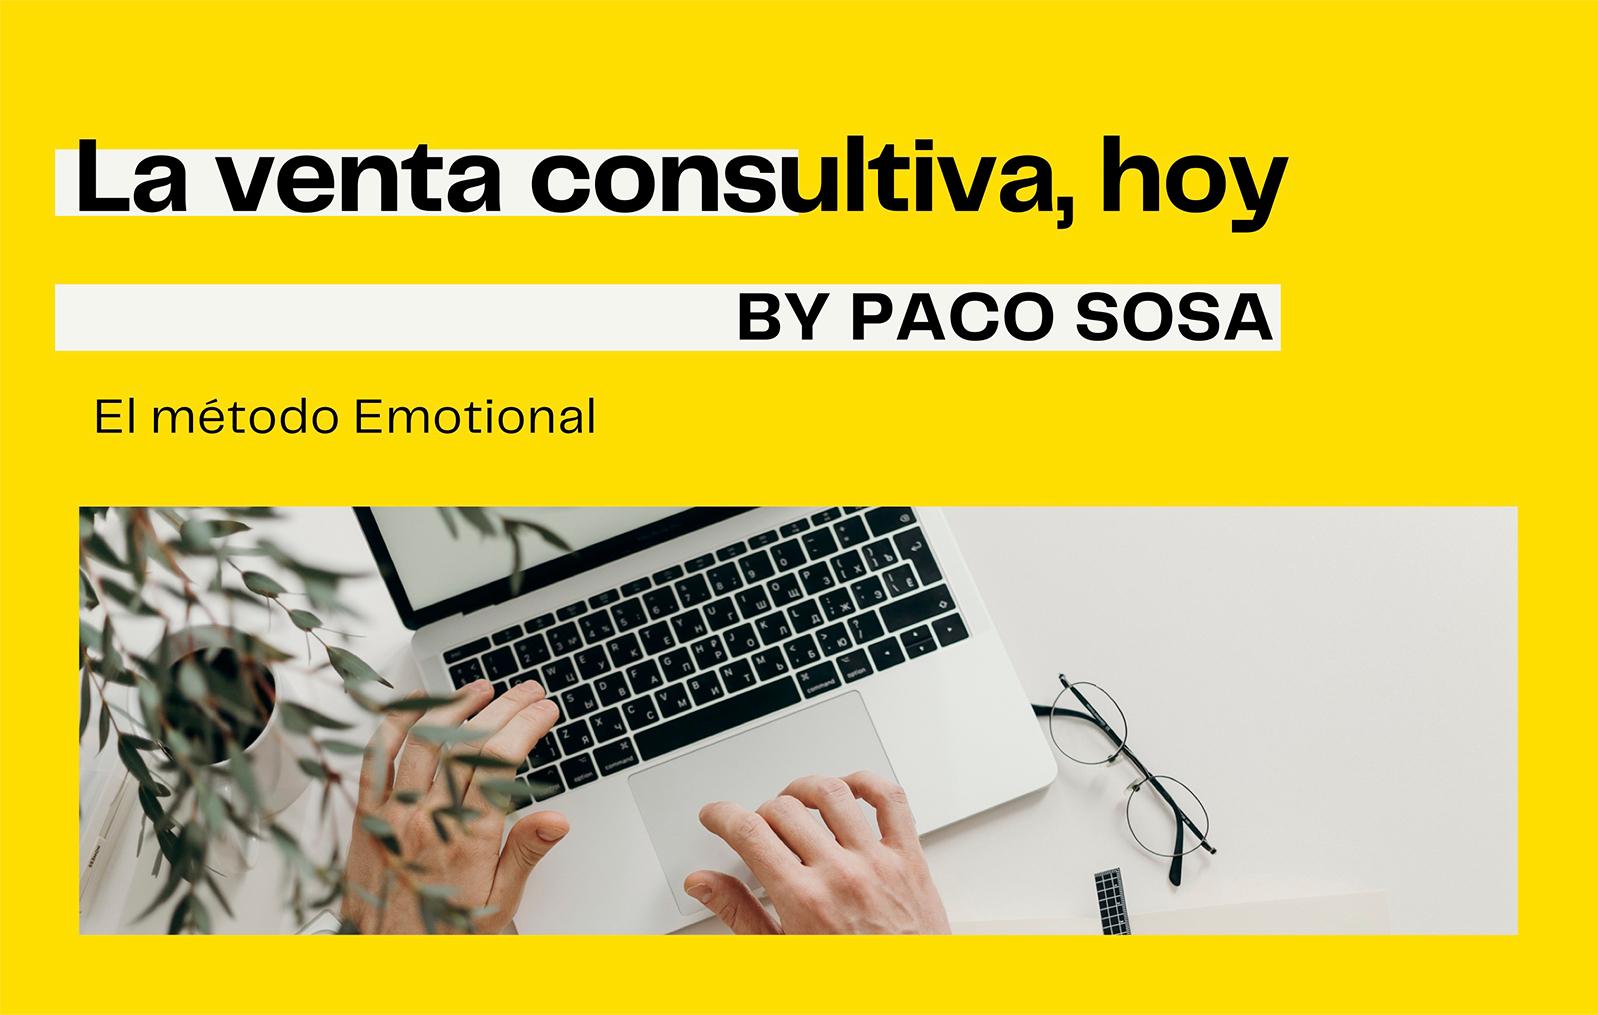 La venta consultiva, hoy by Paco Sosa